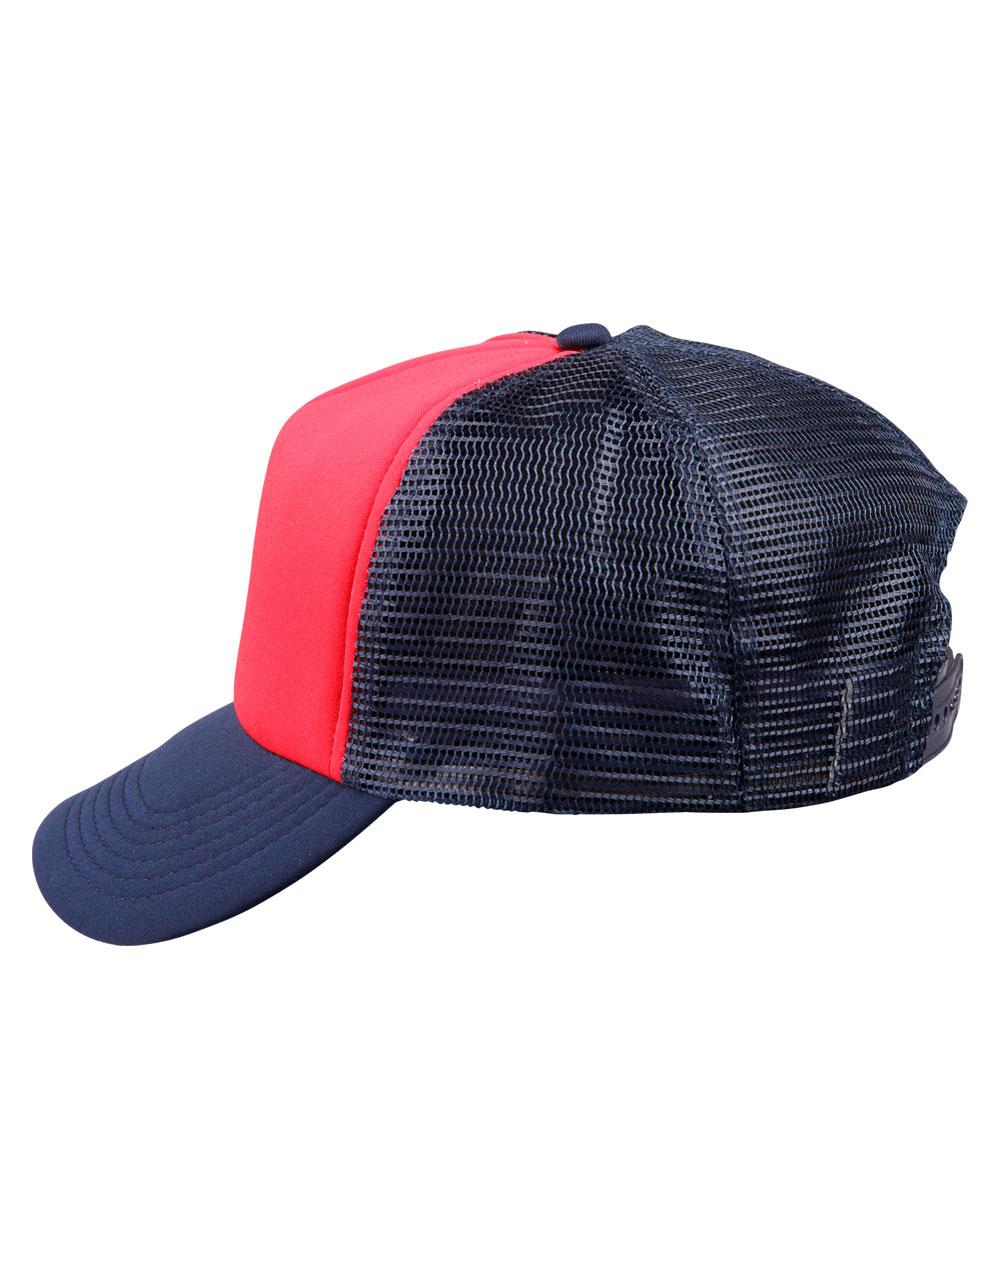 https://s3-ap-southeast-1.amazonaws.com/ws-imgs/CAPS/CH69_Red.Navy_Side.jpg